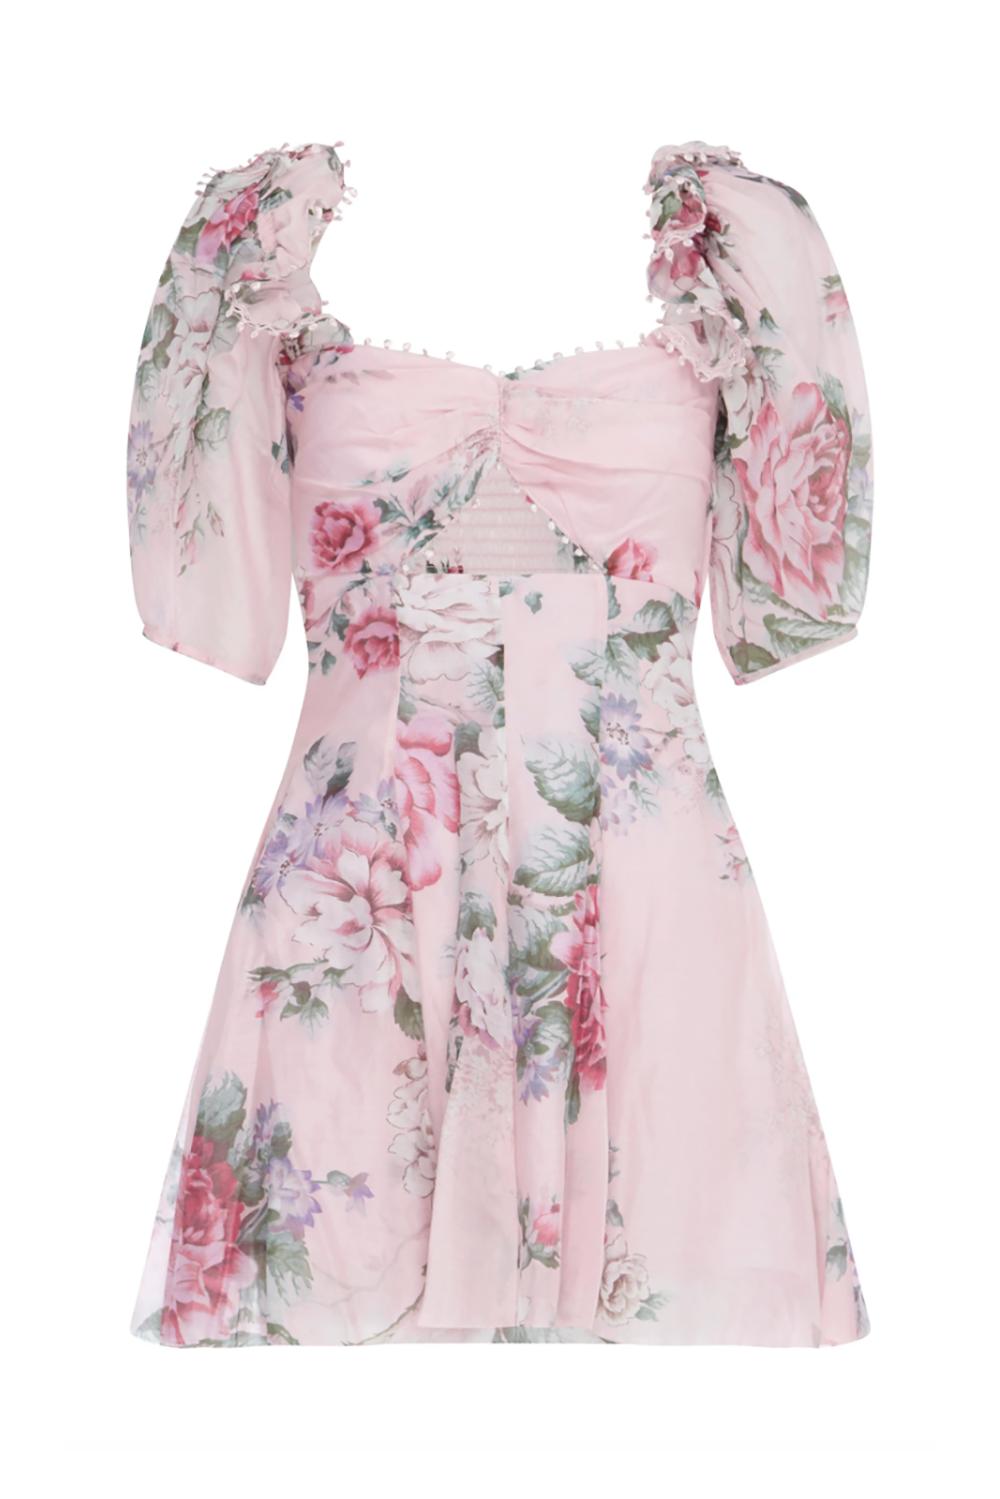 Peony Dress by Alice McCall Alice McCall modaoperandi.com $450.00 SHOP IT